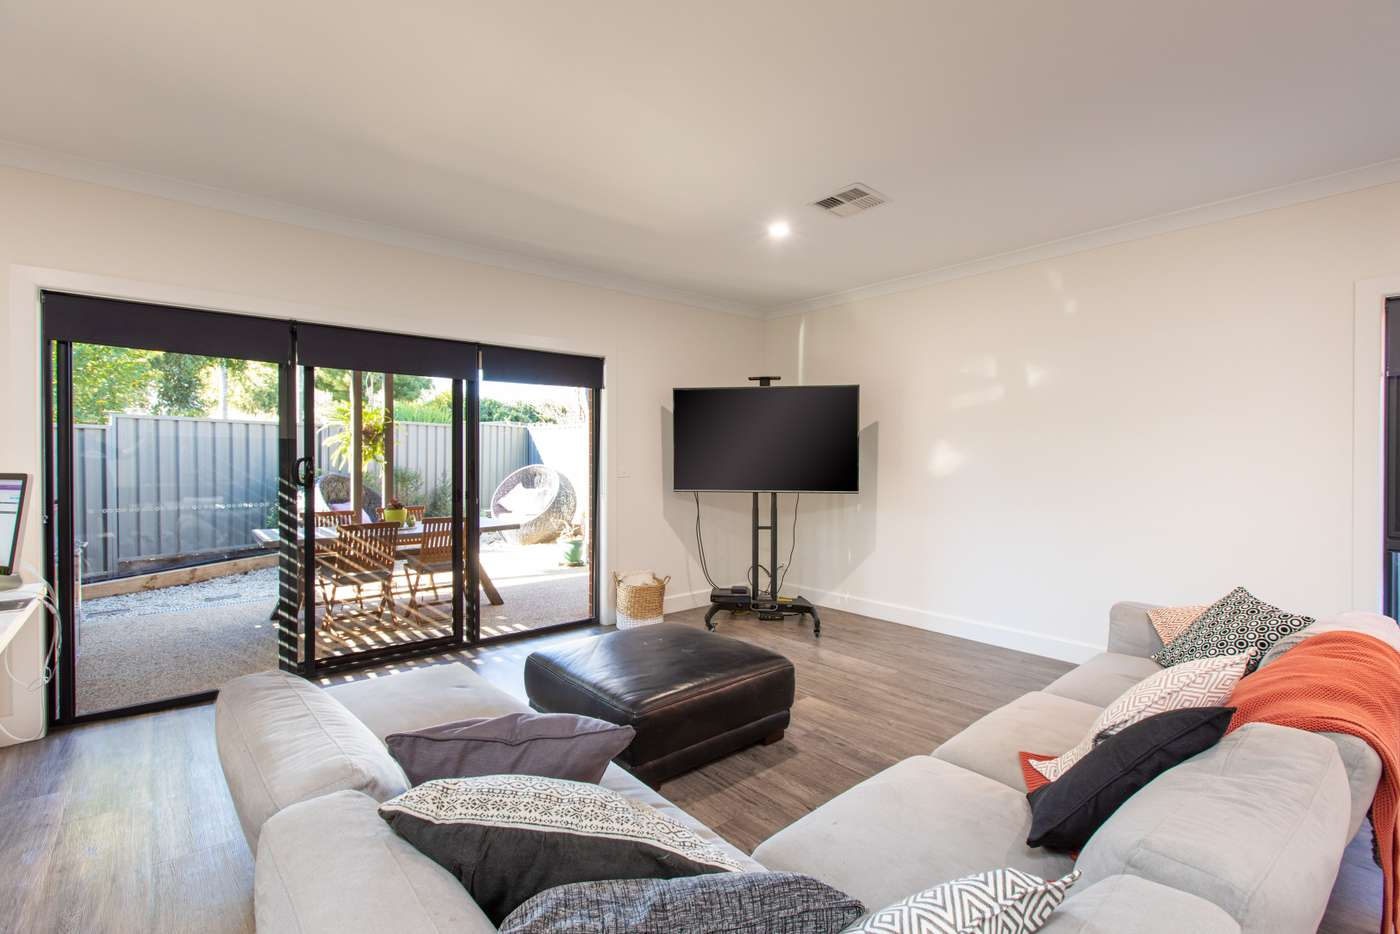 Fifth view of Homely house listing, 174a Thirteenth Street, Mildura VIC 3500